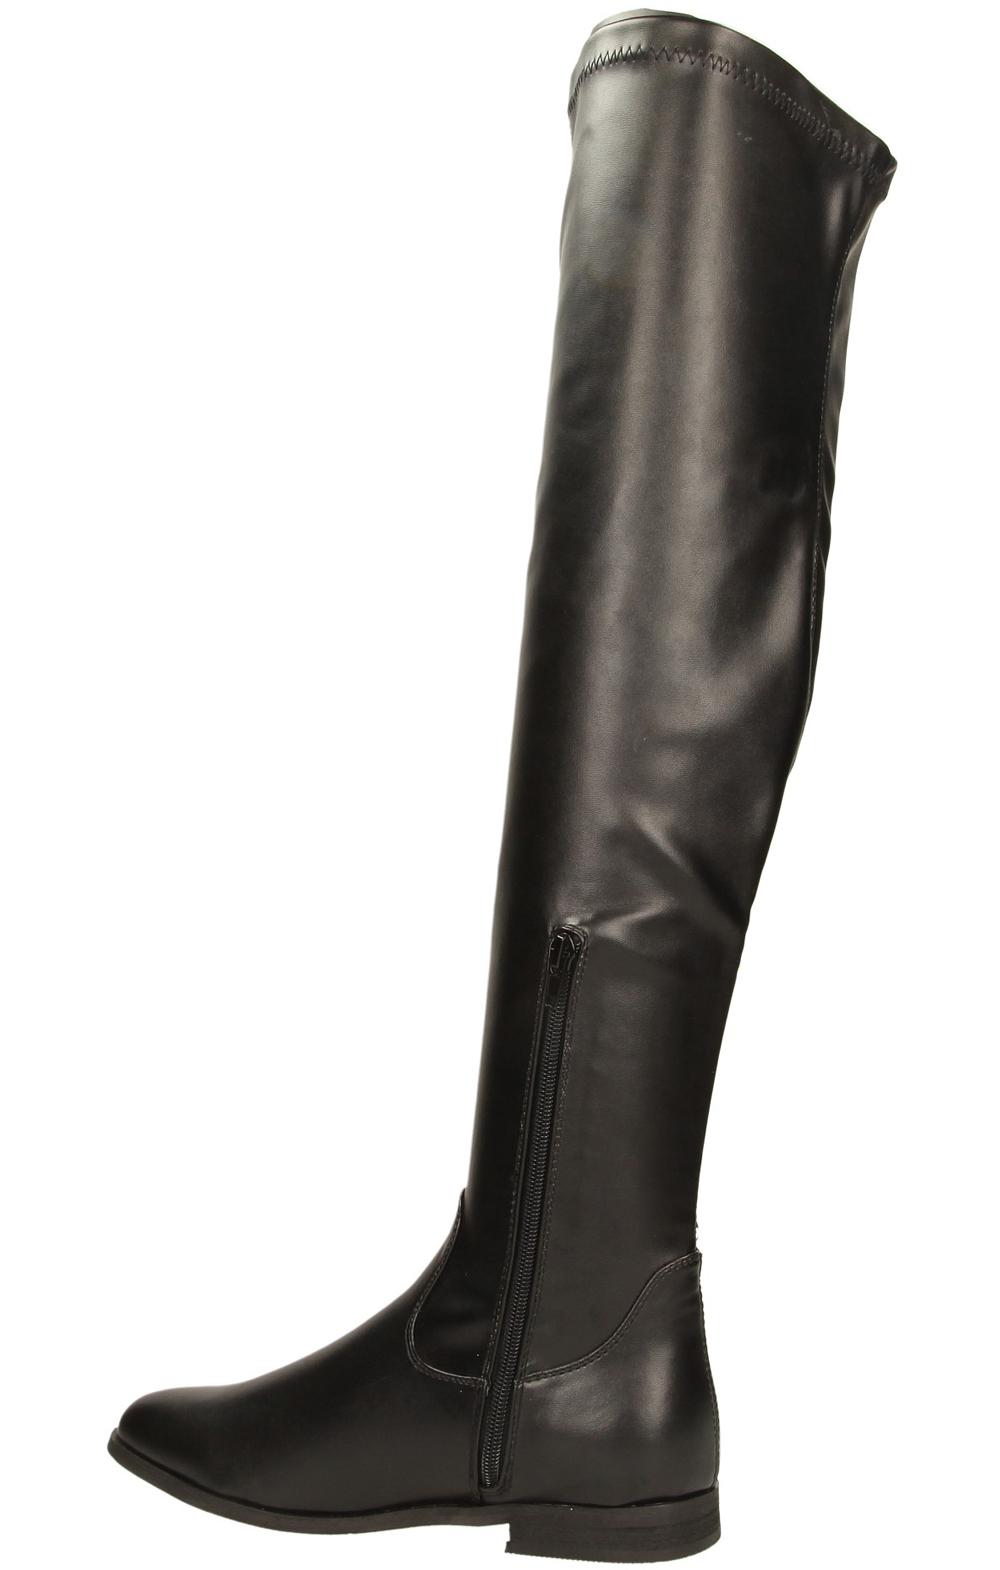 1f29cba6b6a21 ... KOZAKI BLINK 102066-A-01 kolor czarny. » «